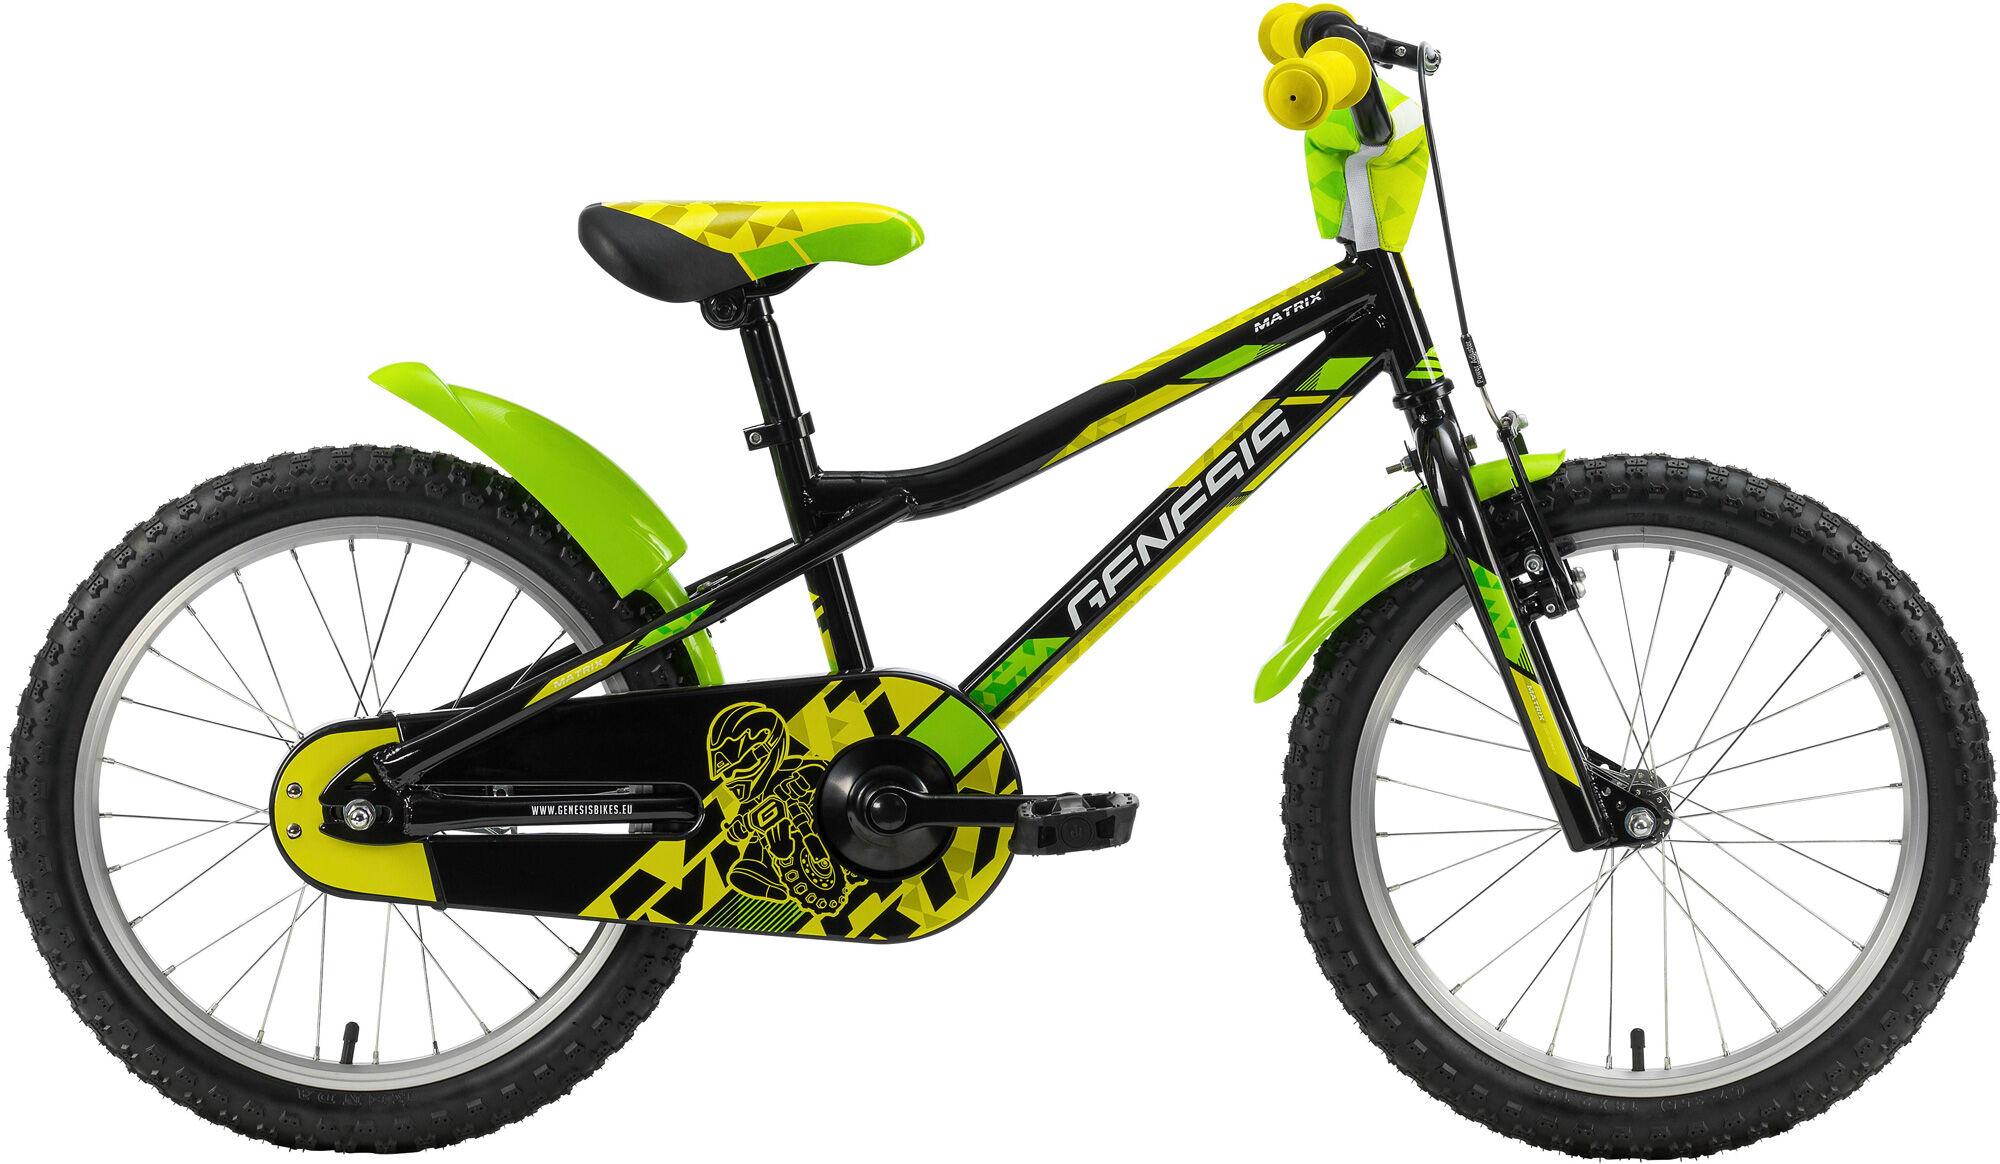 Princessa 18 Fahrrad 18 · grün · Kinder » GENESIS® | INTERSPORT